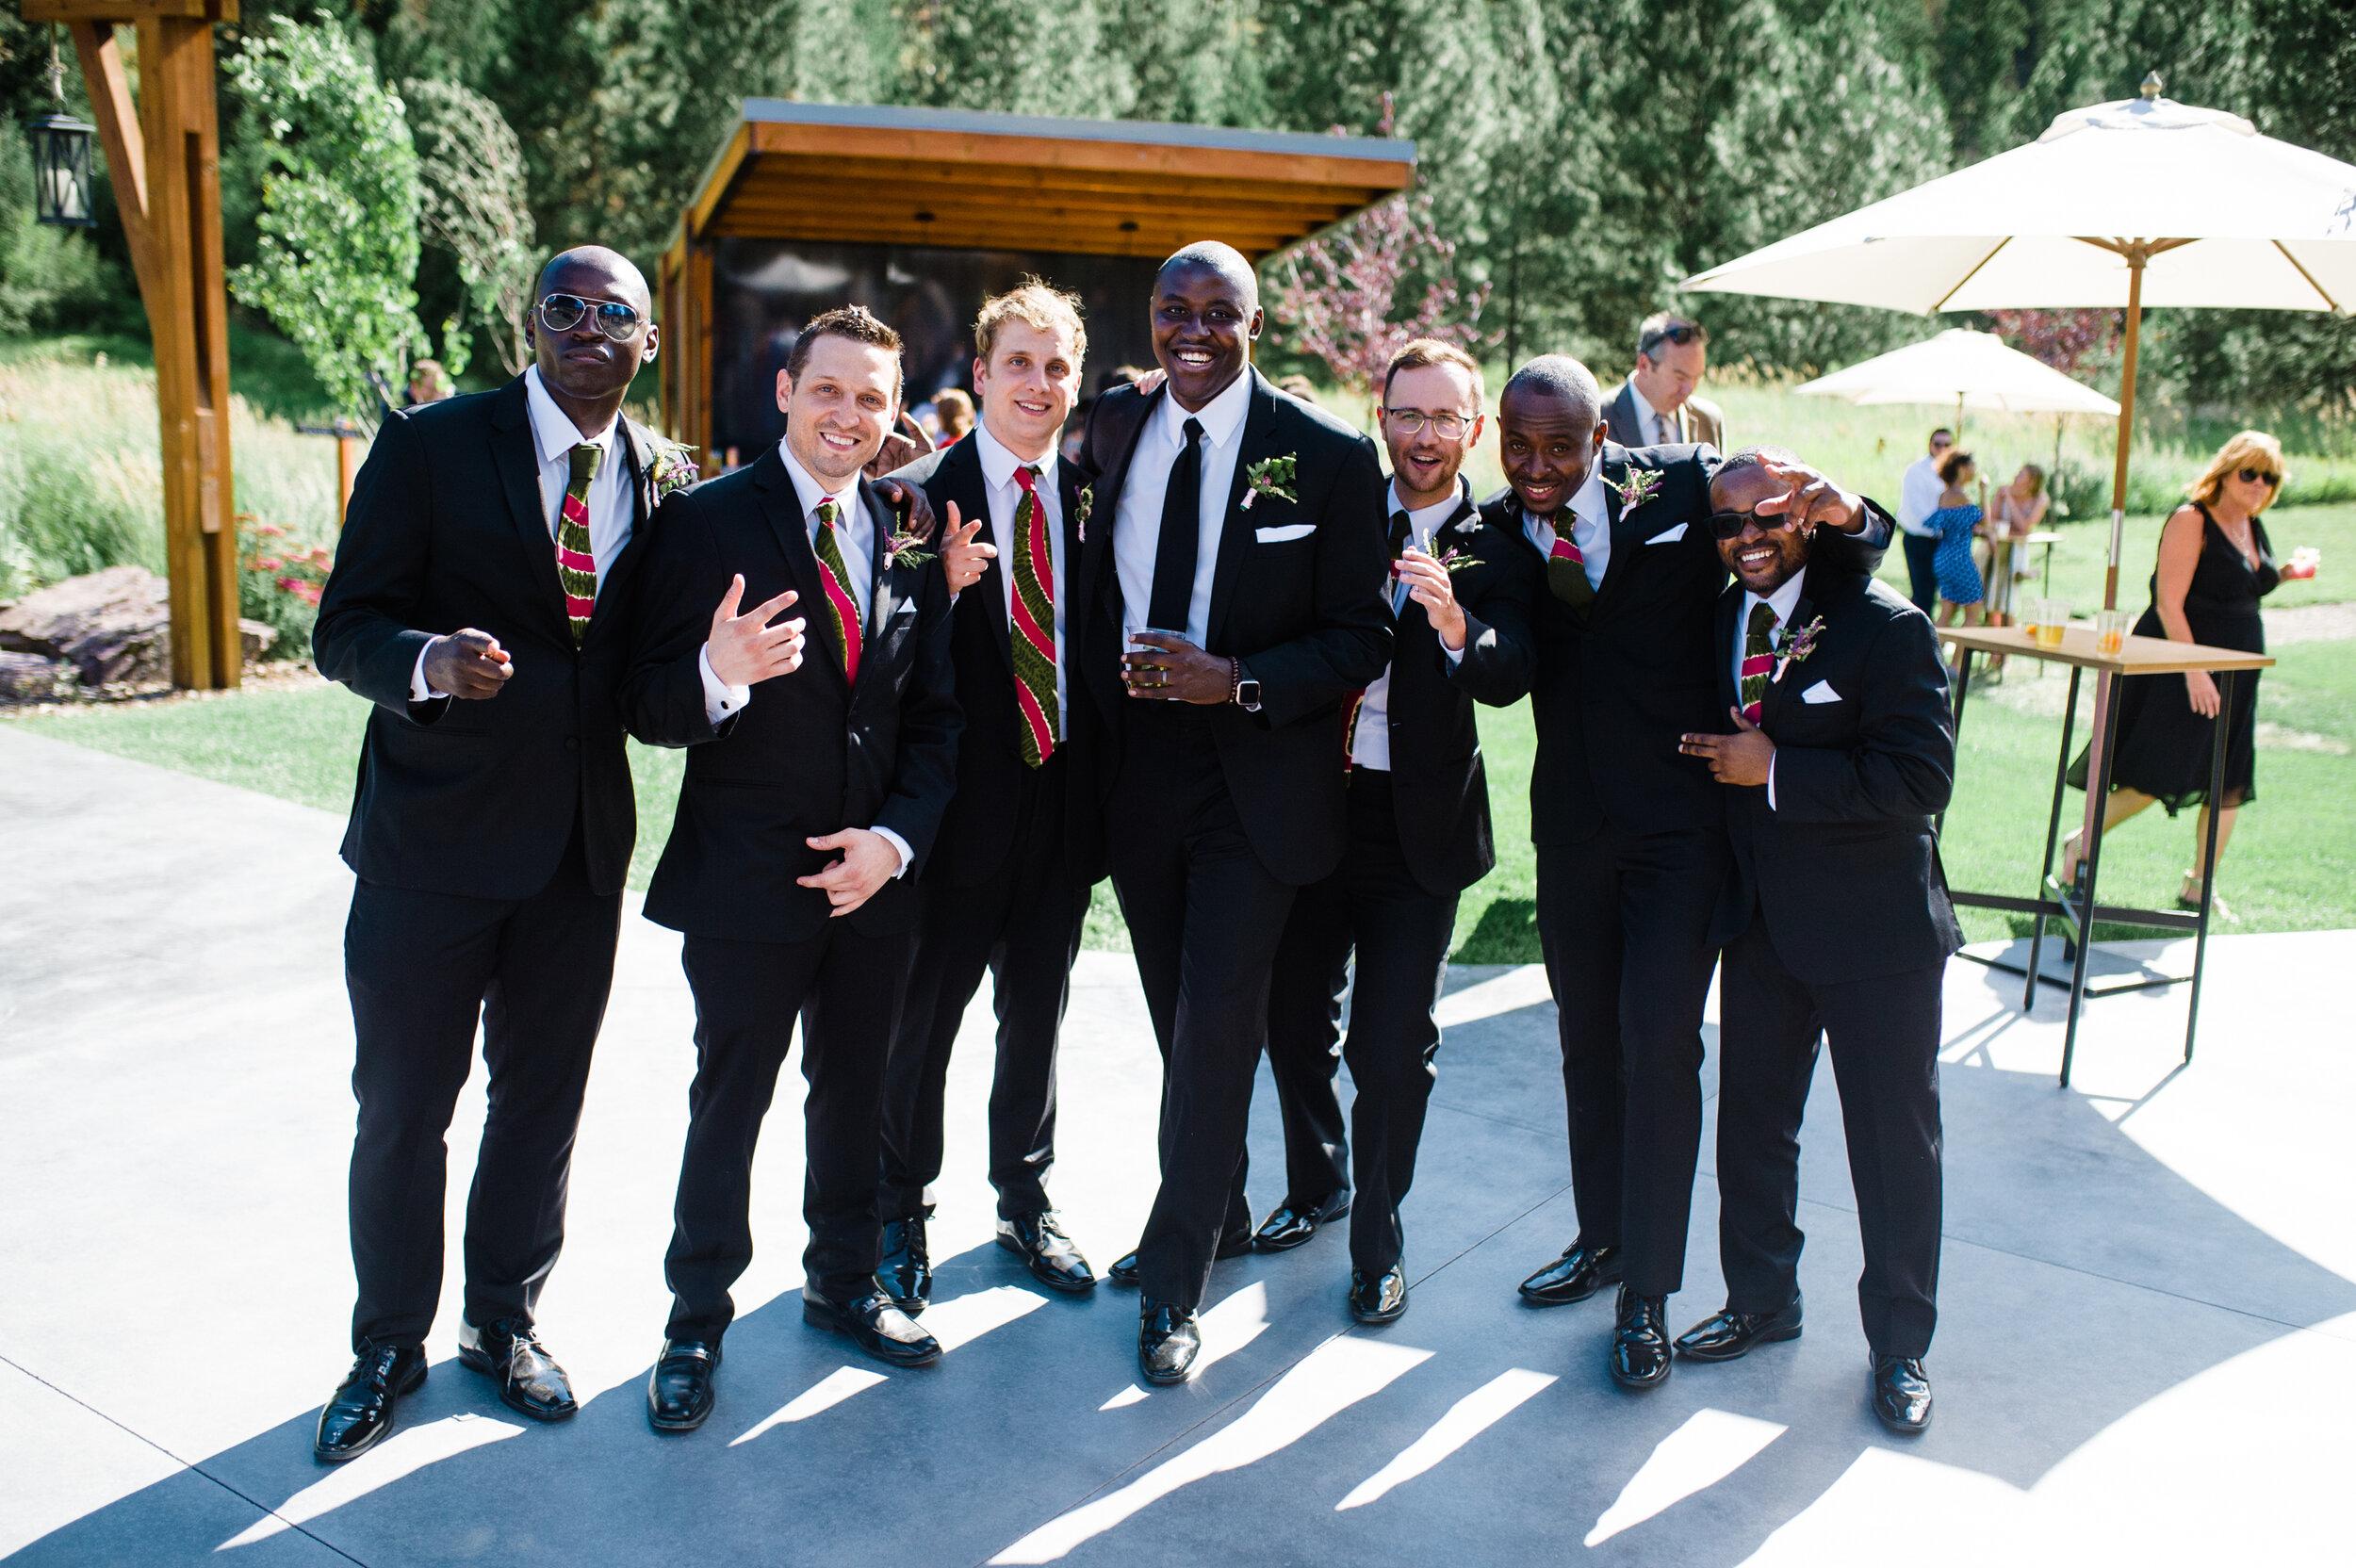 626White Raven Wedding_Montana Wedding Photographer_Rebekah & Likom_Honeybee Weddings_July 27, 2019-2550.jpg